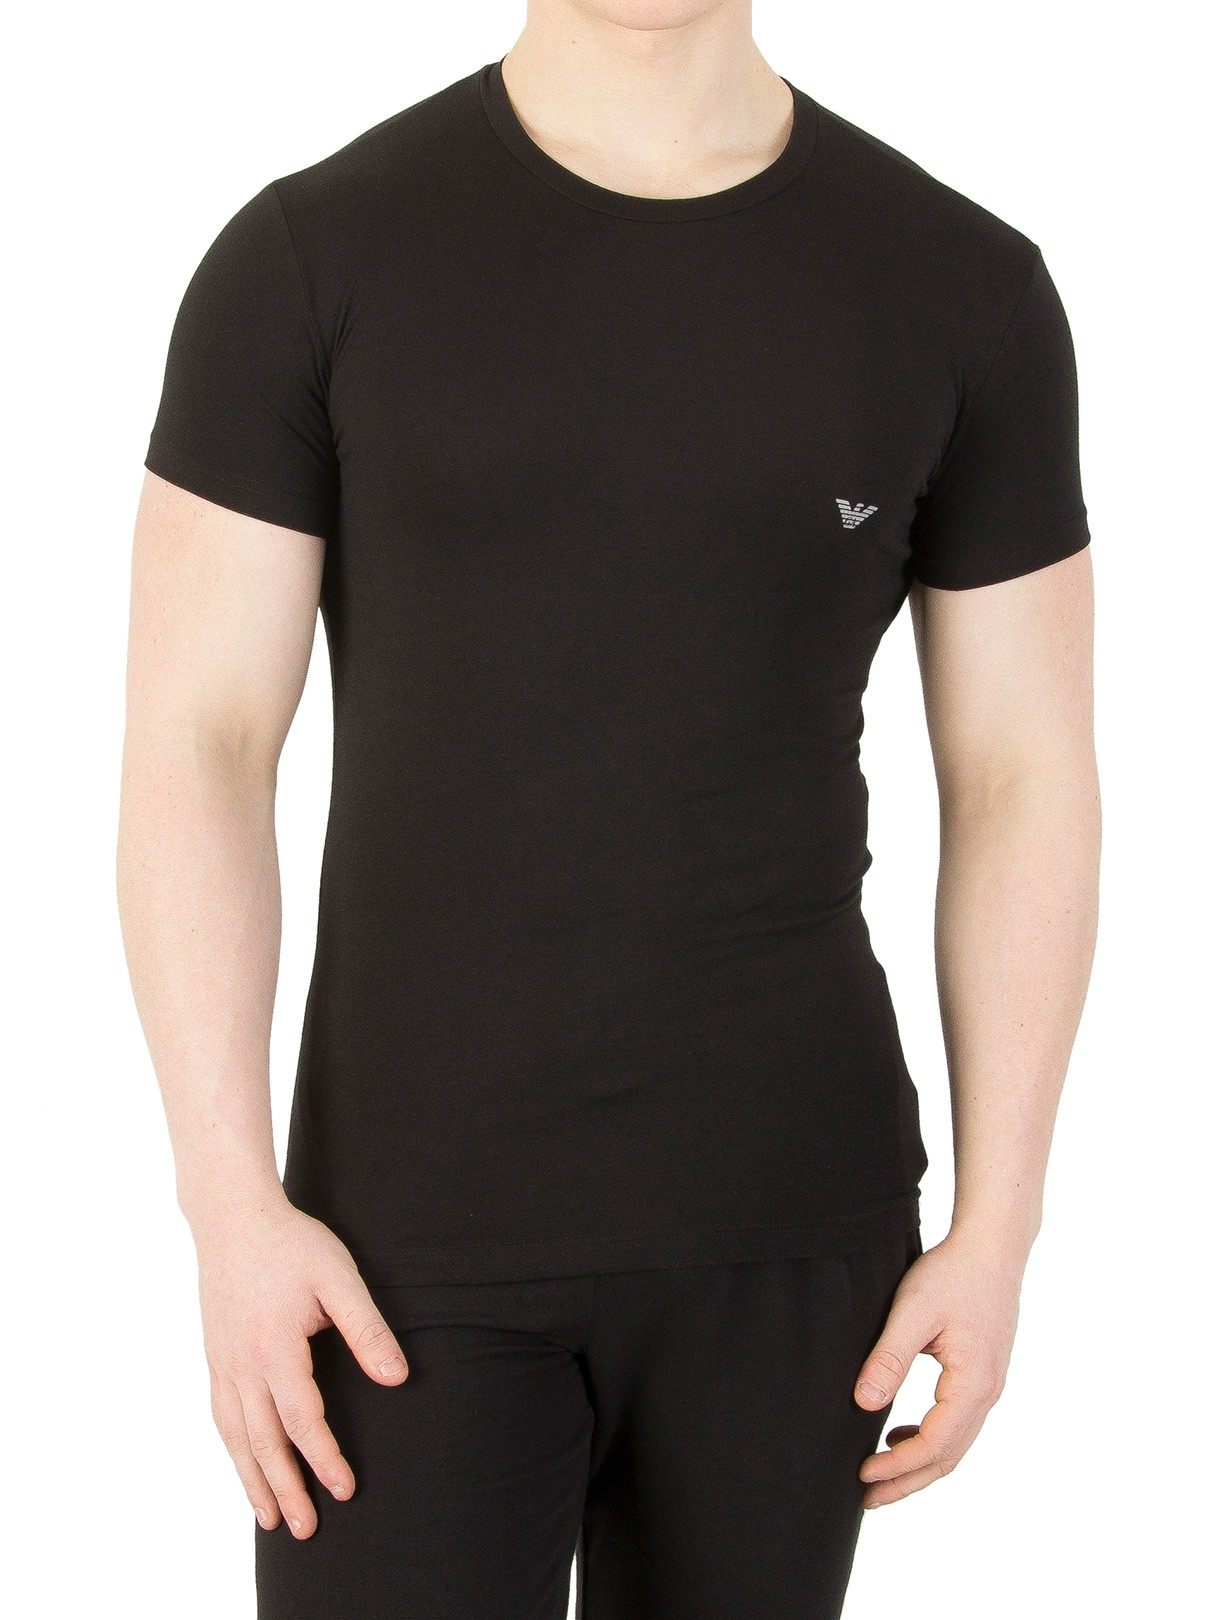 Emporio armani black crew logo t shirt standout for Black armani t shirt